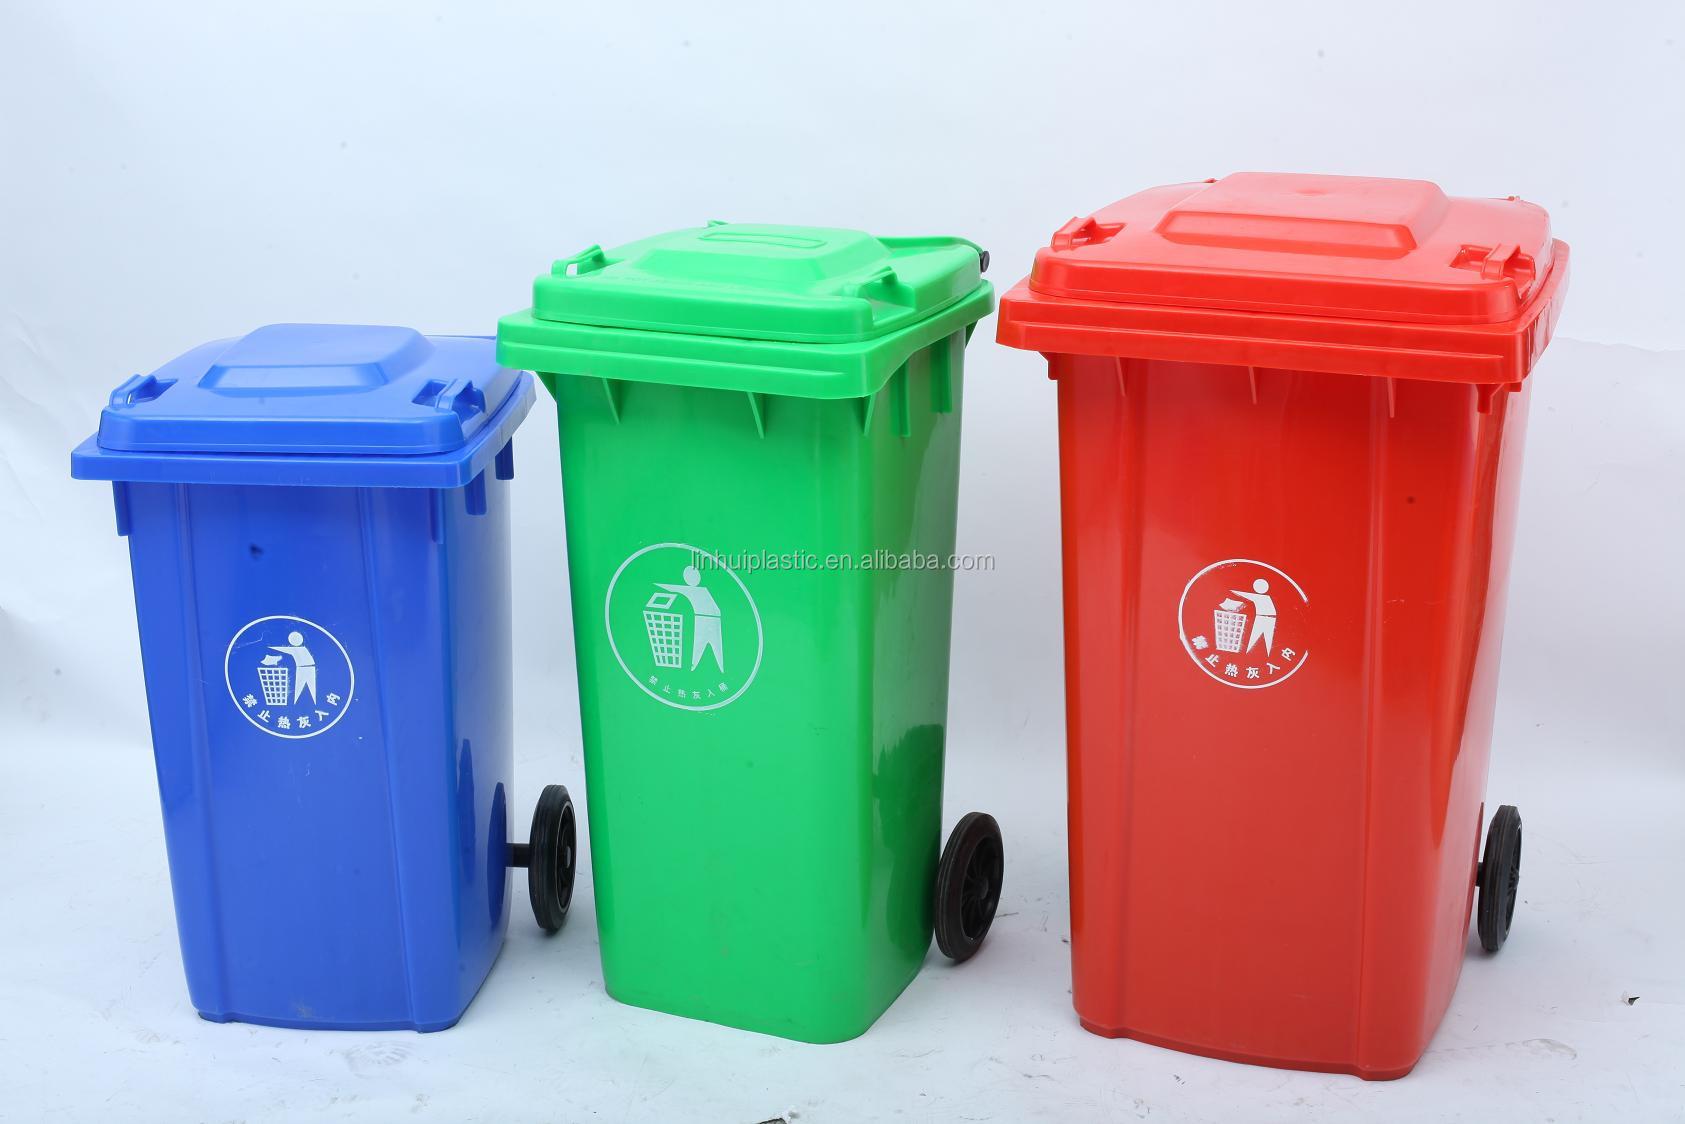 120l Durable Cheap Bio Medical Waste Bins Price